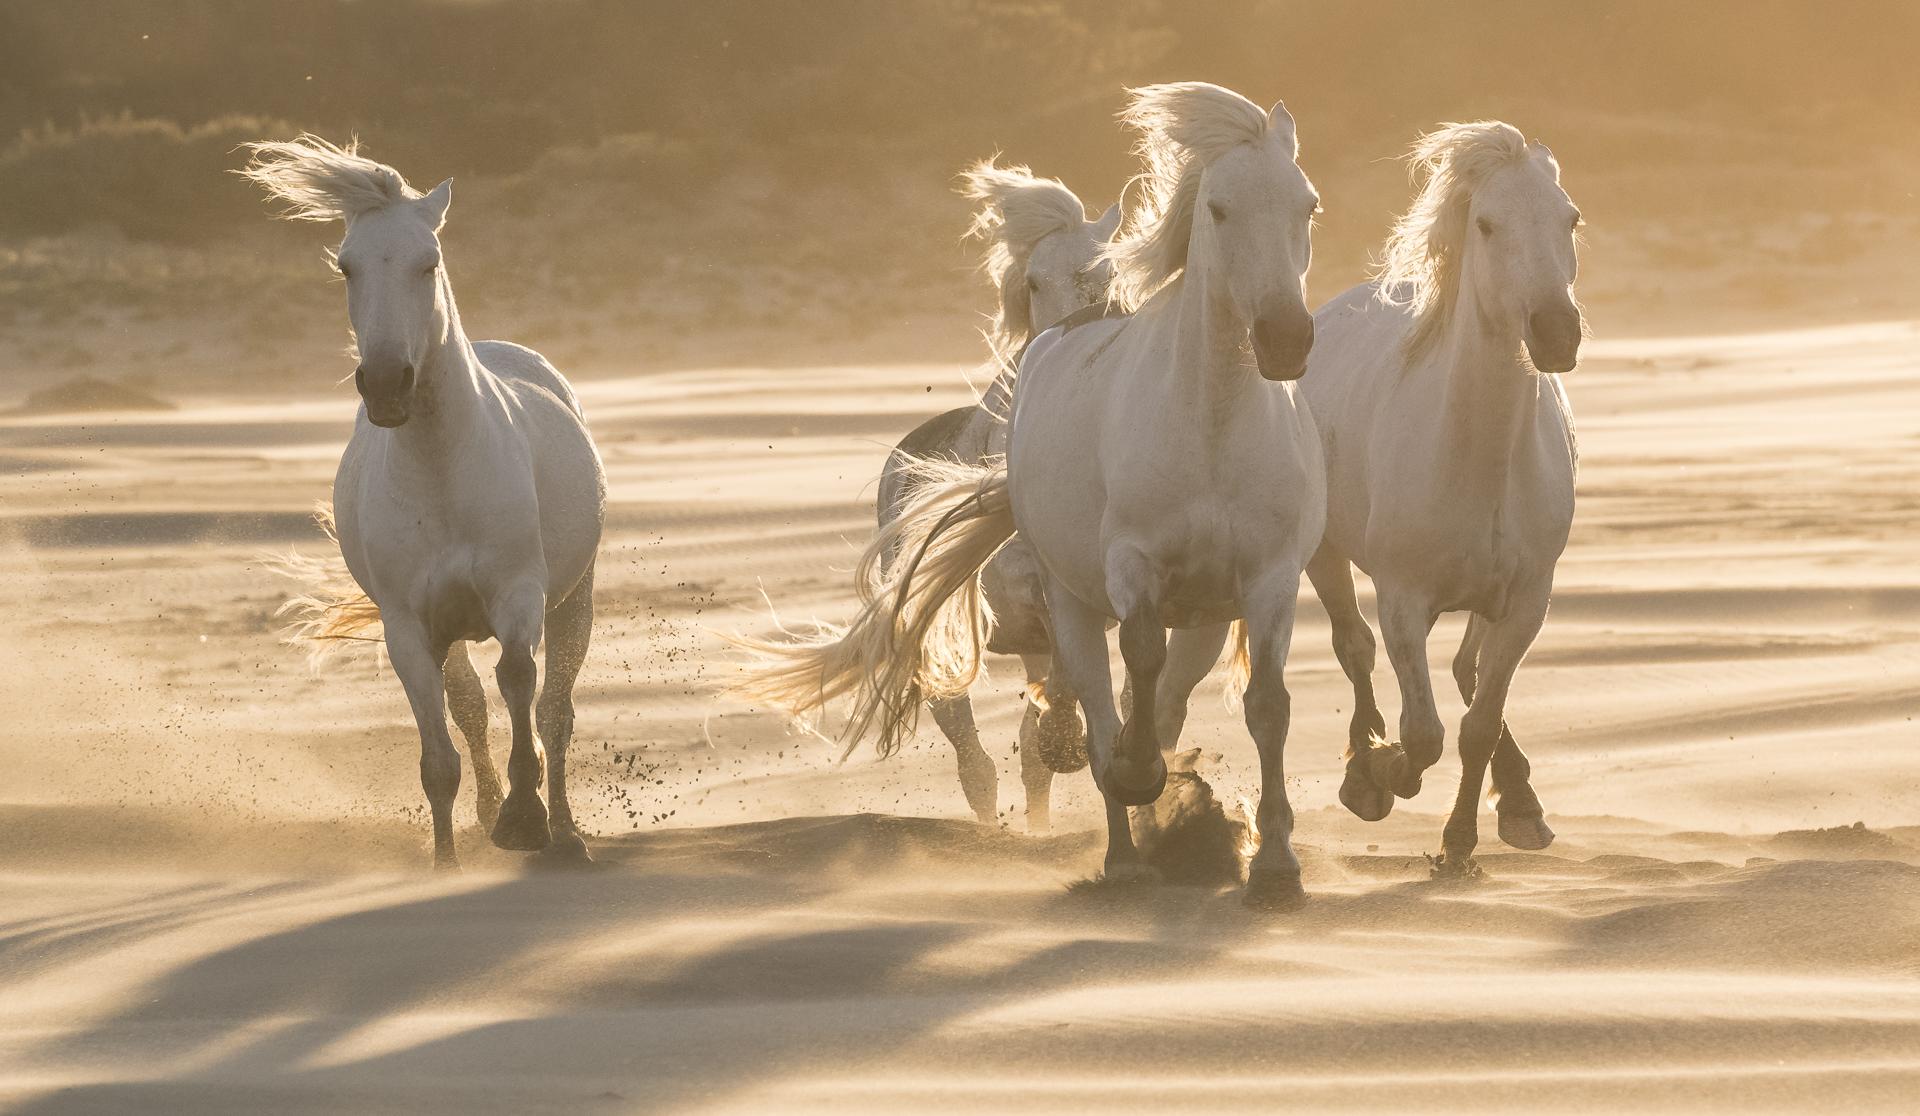 Camargue horses galloping in sand dunes. Parc naturel régional de Camargue, France.